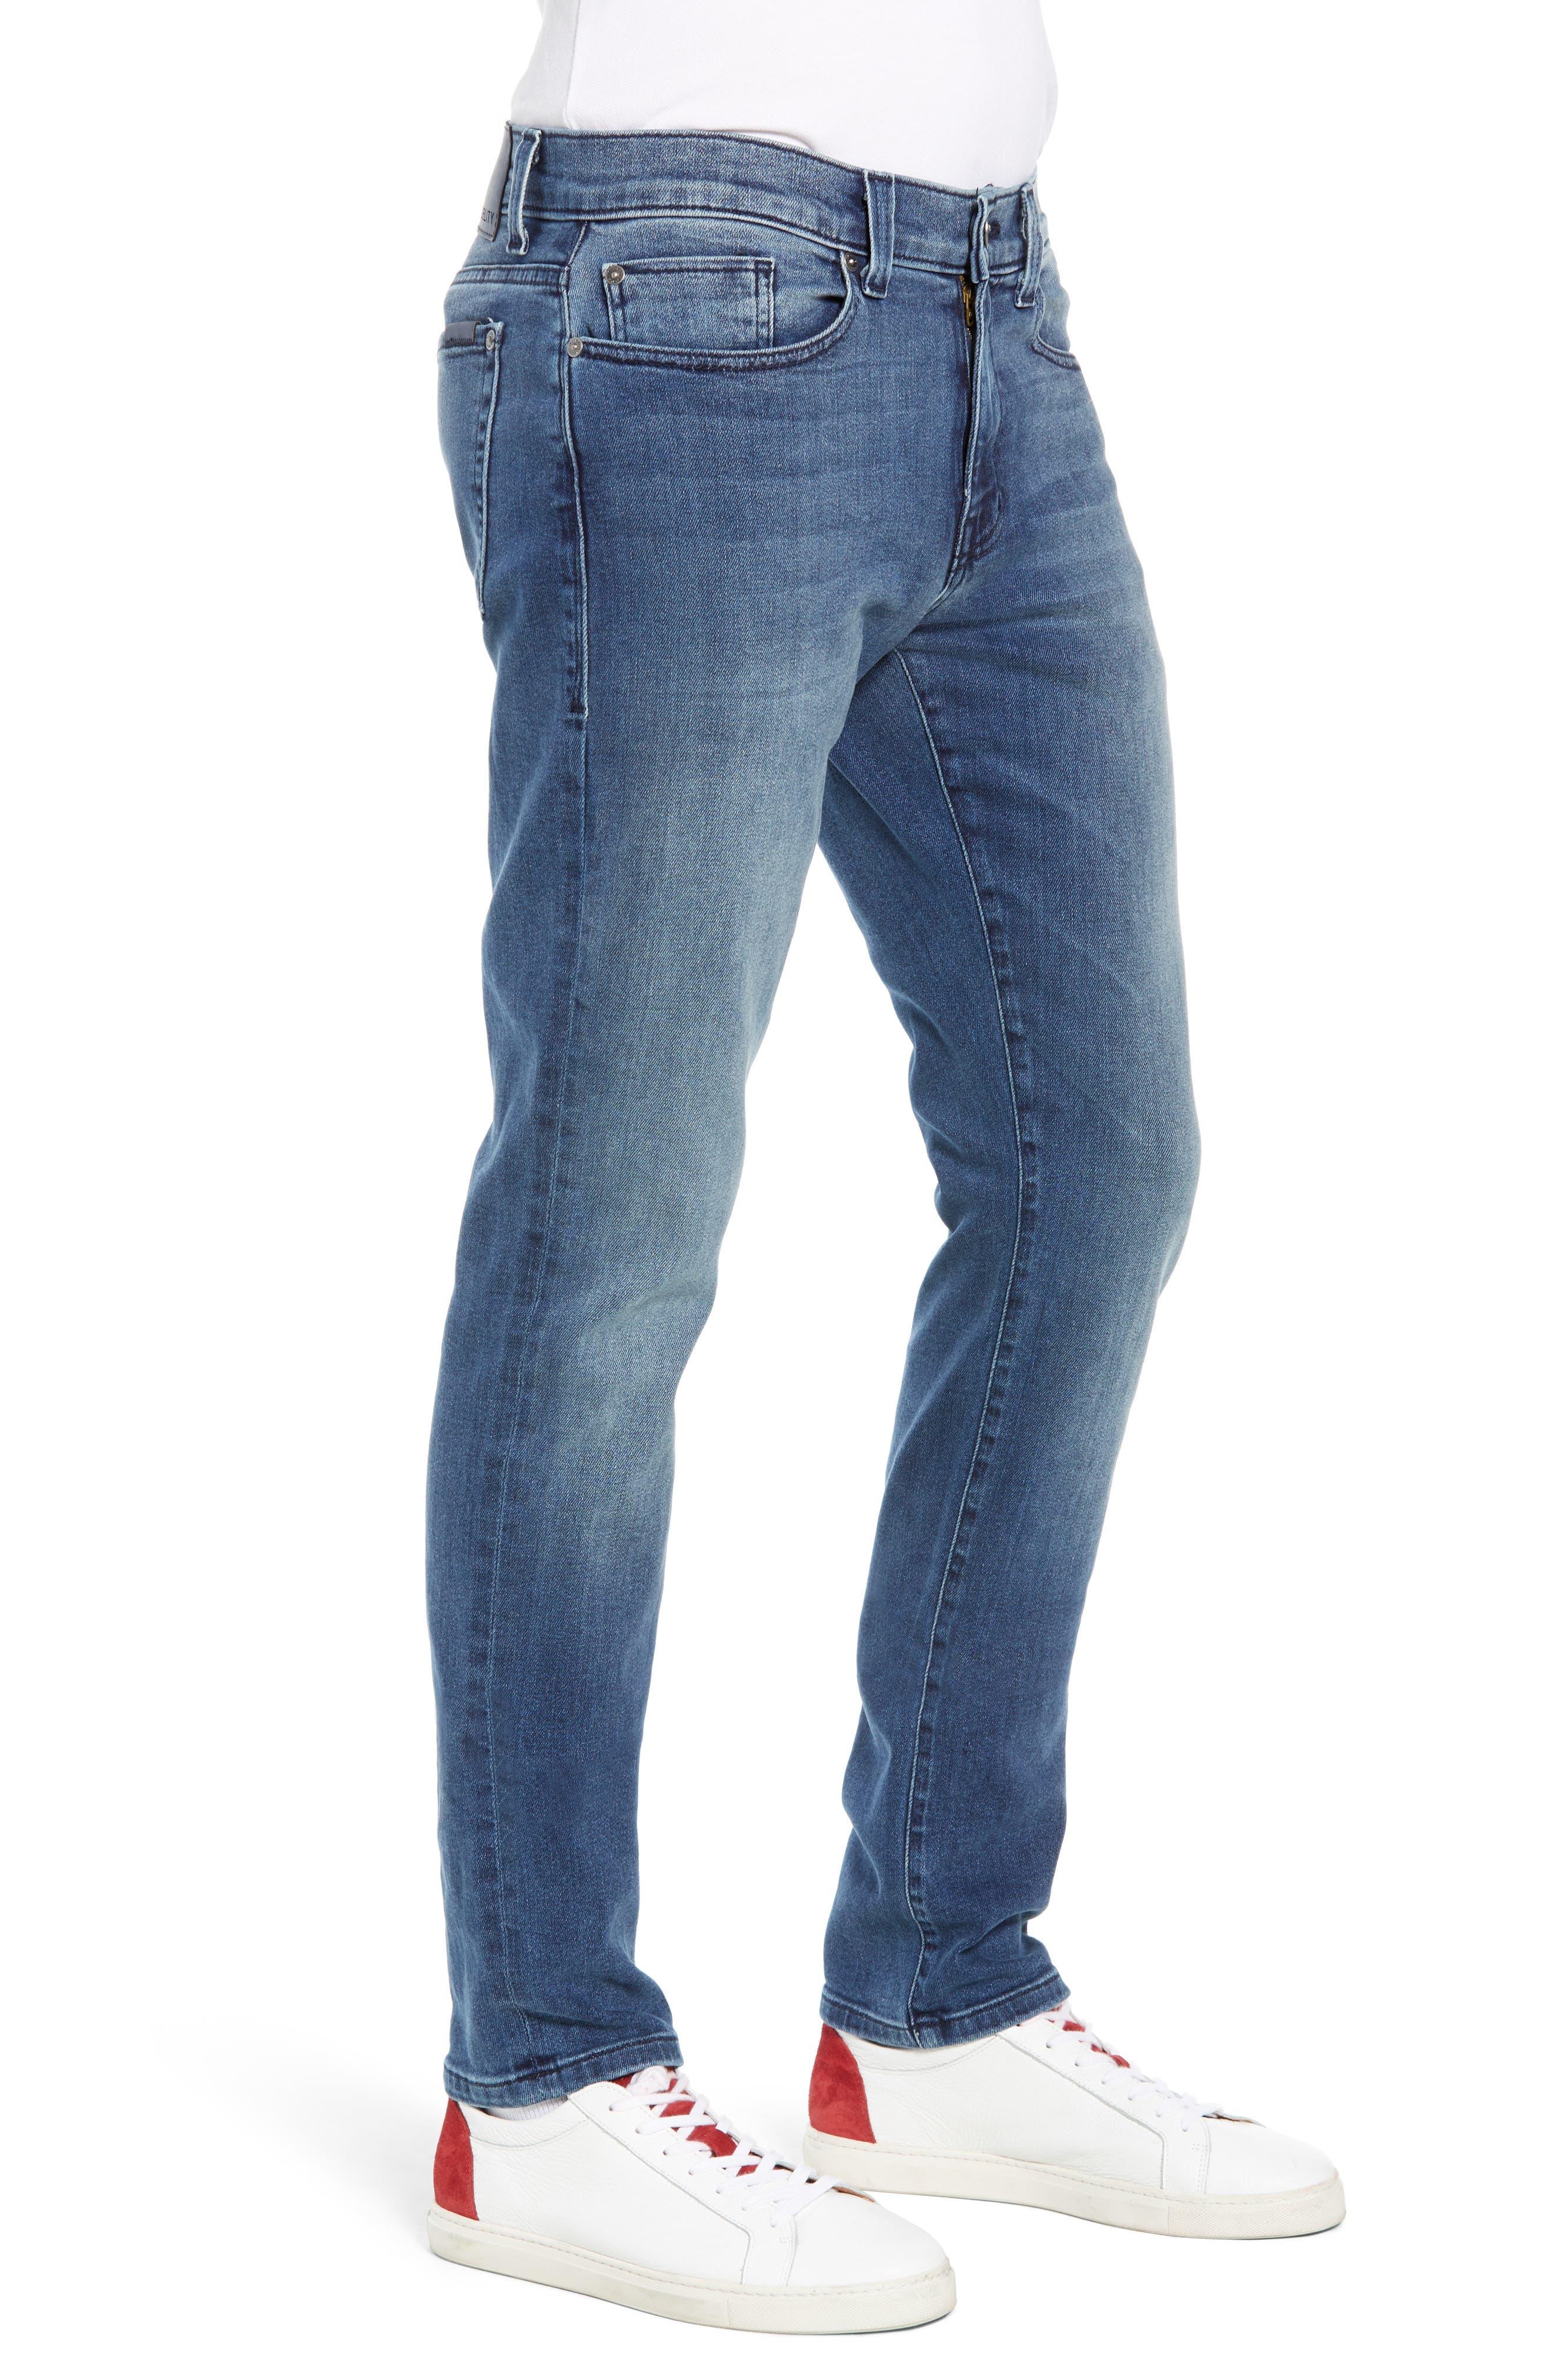 Torino Slim Fit Jeans,                             Alternate thumbnail 3, color,                             EMPIRE BLUE